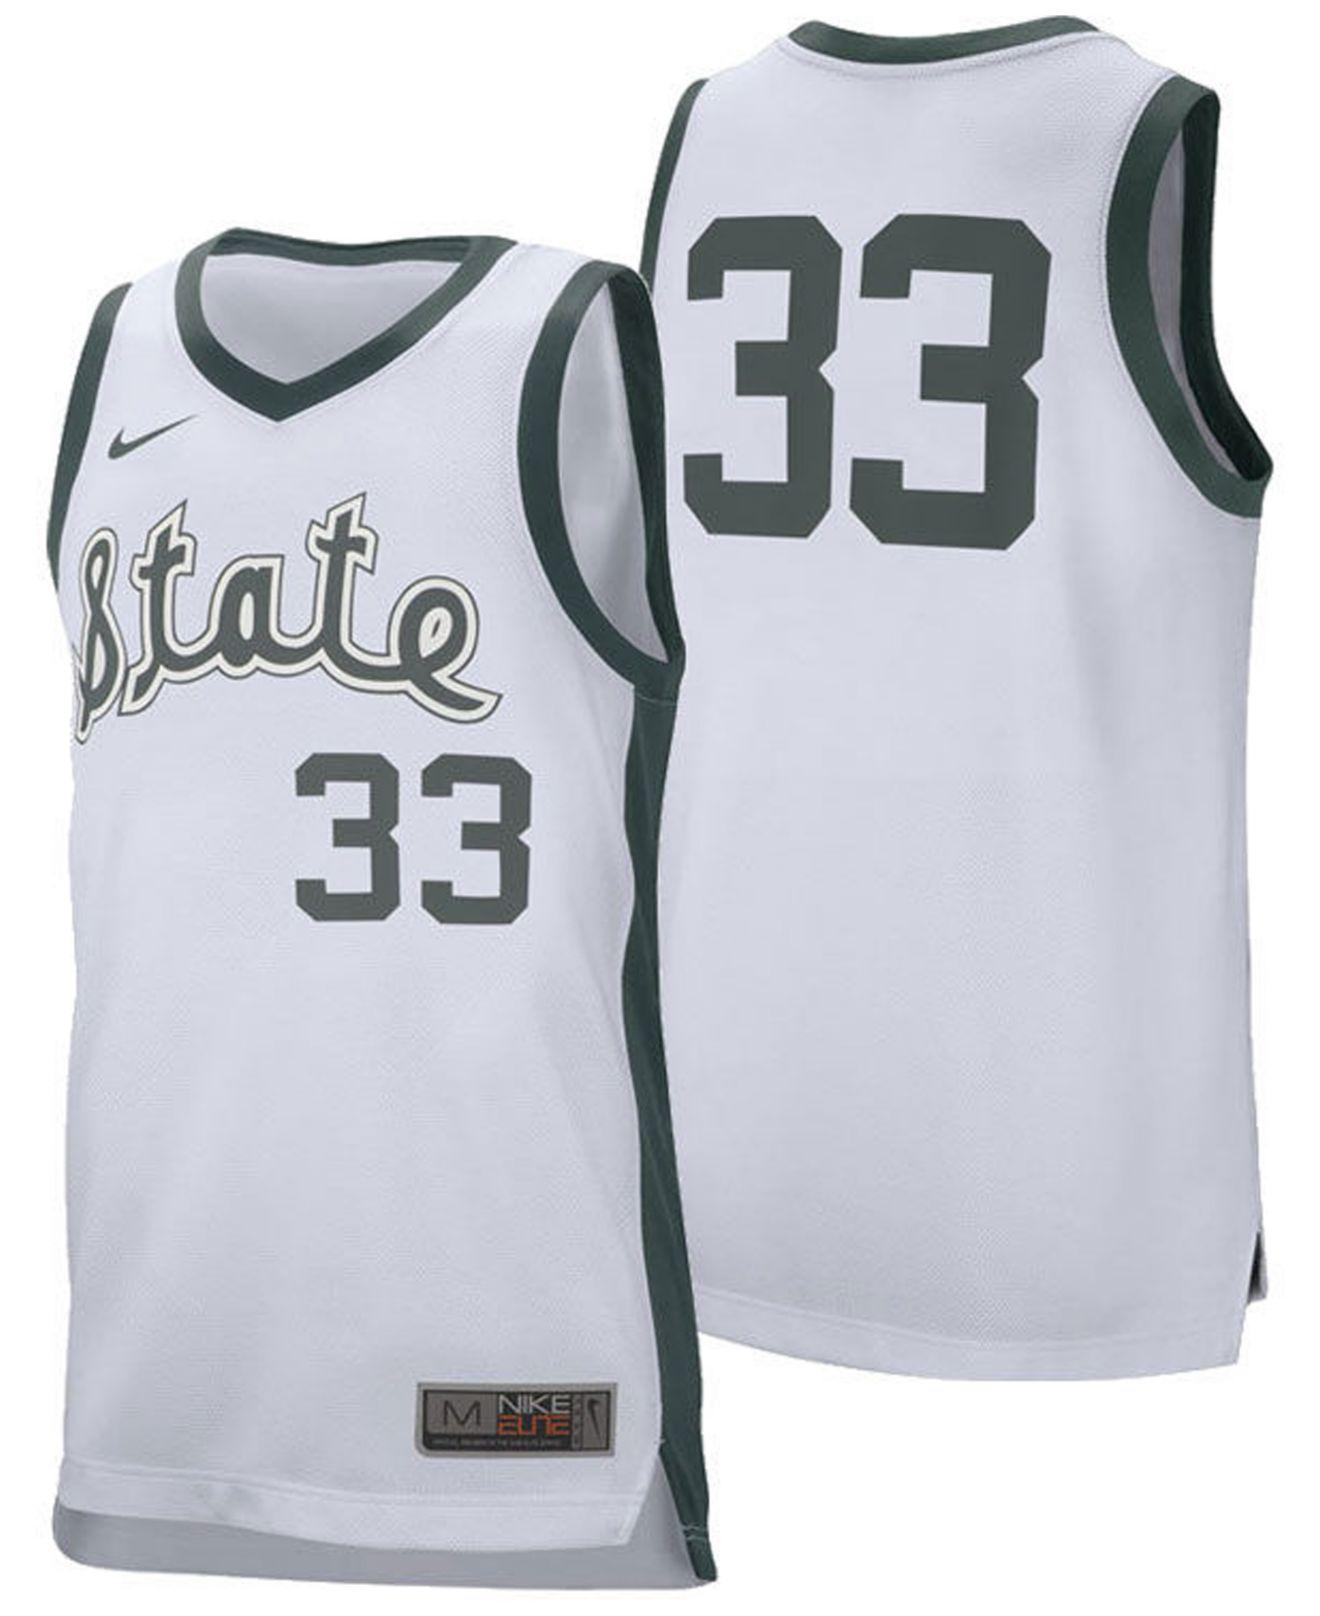 info for 8332b 50f67 Men's White Michigan State Spartans Retro Basketball Jersey